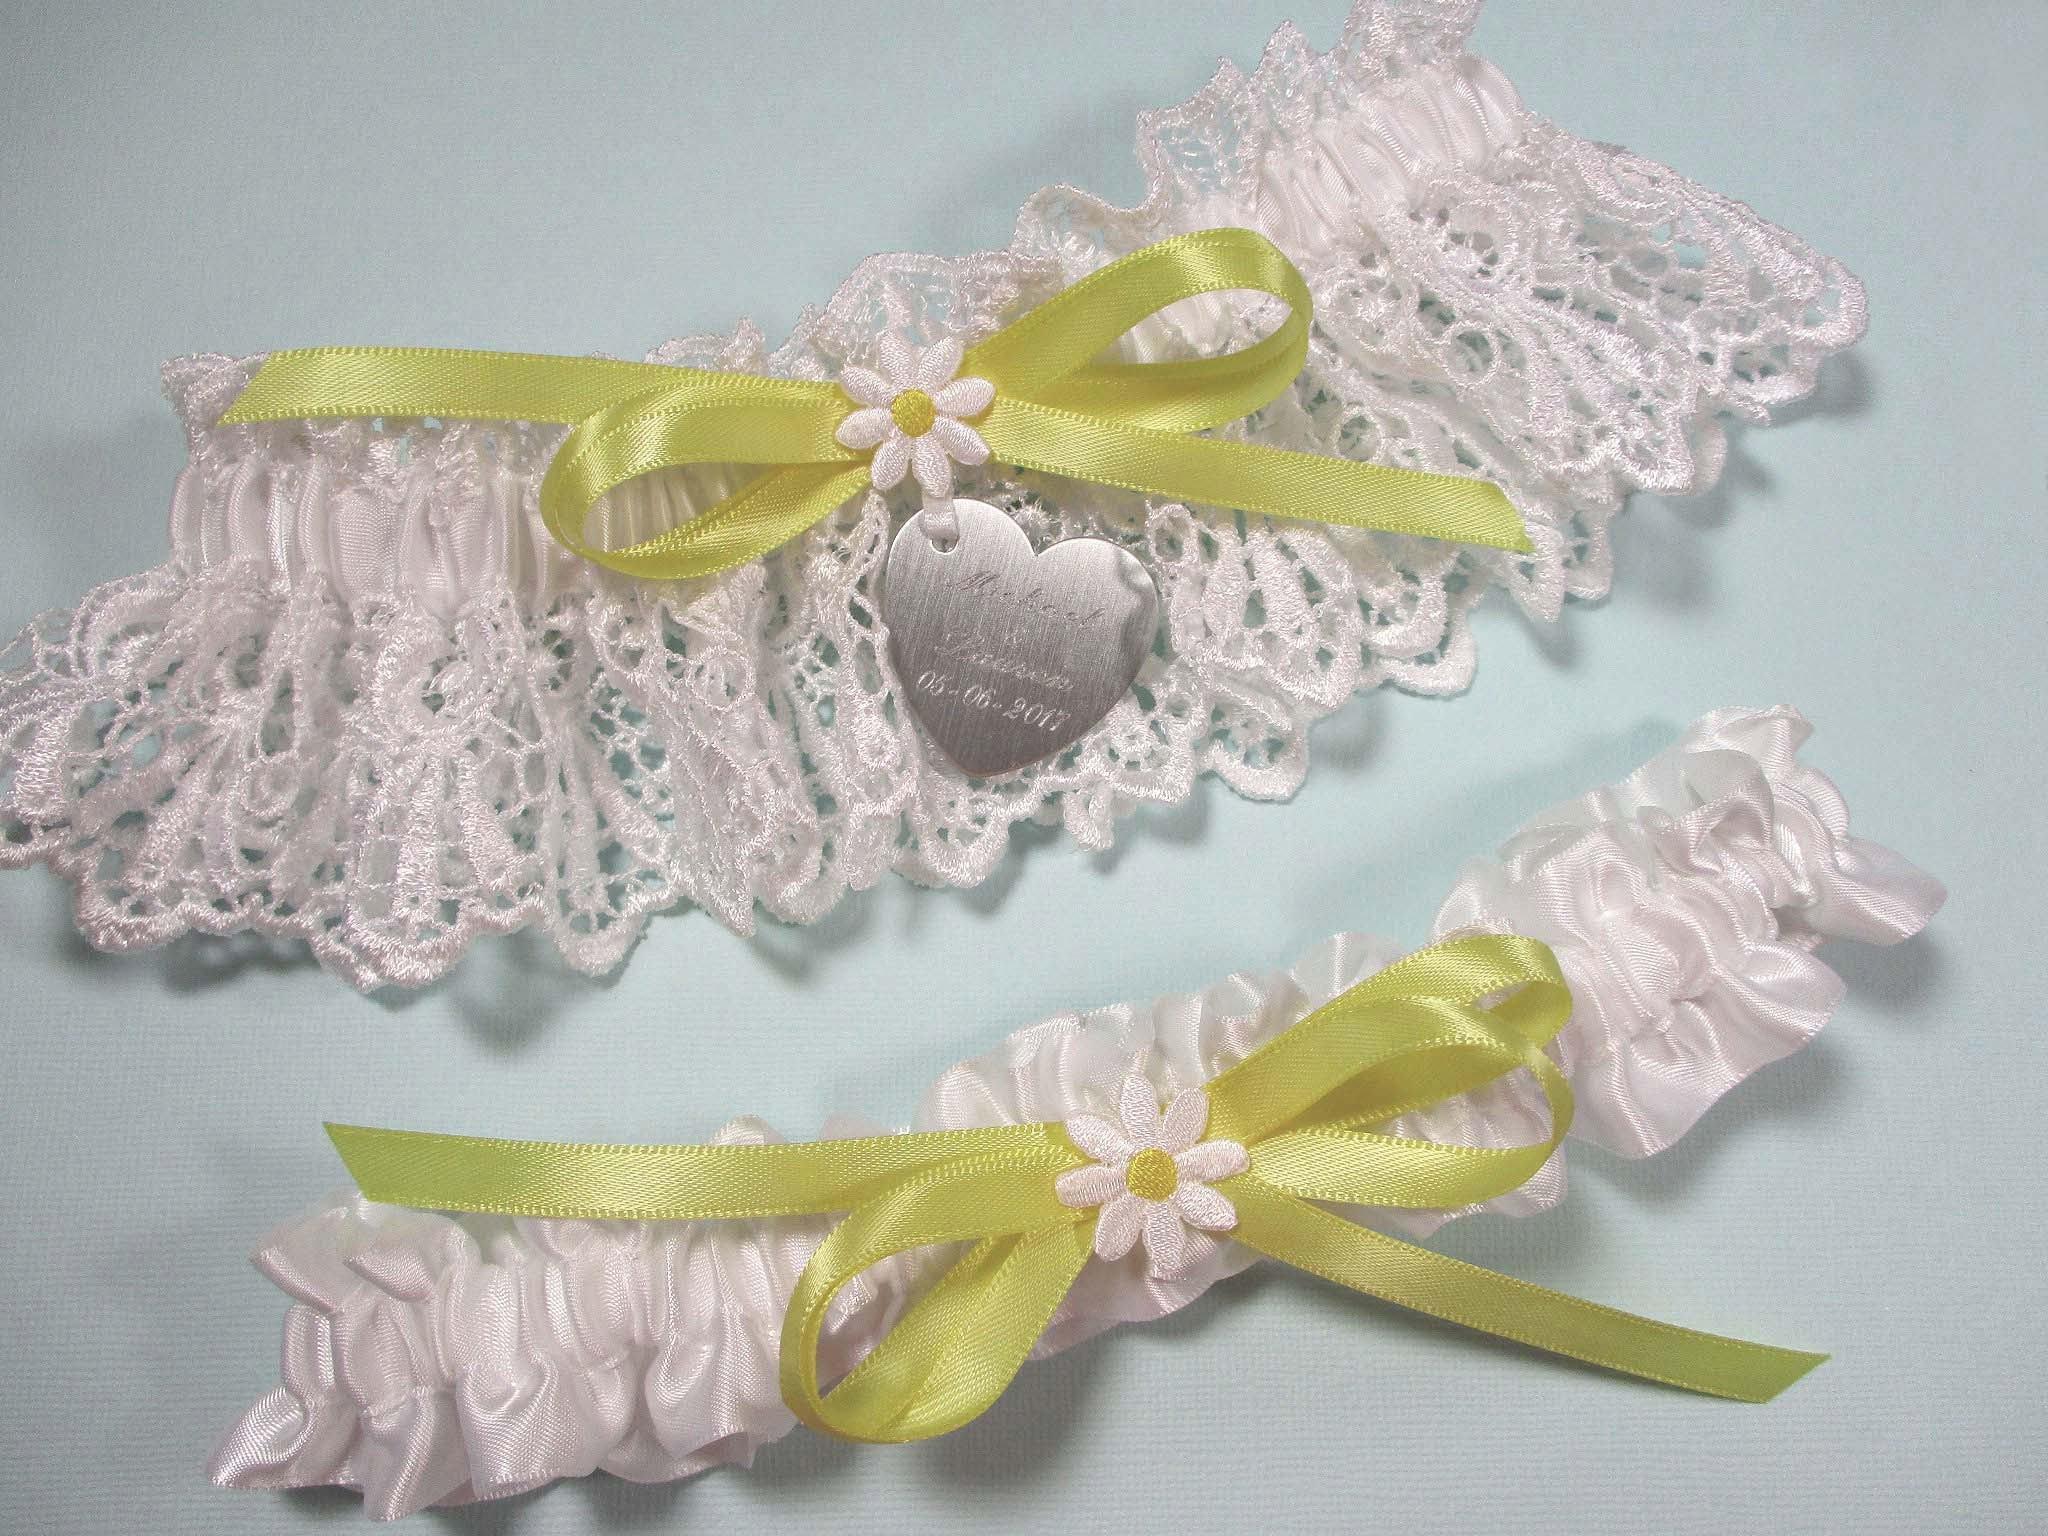 Daisy Wedding Garter Set Personalized Bridal Garters In White